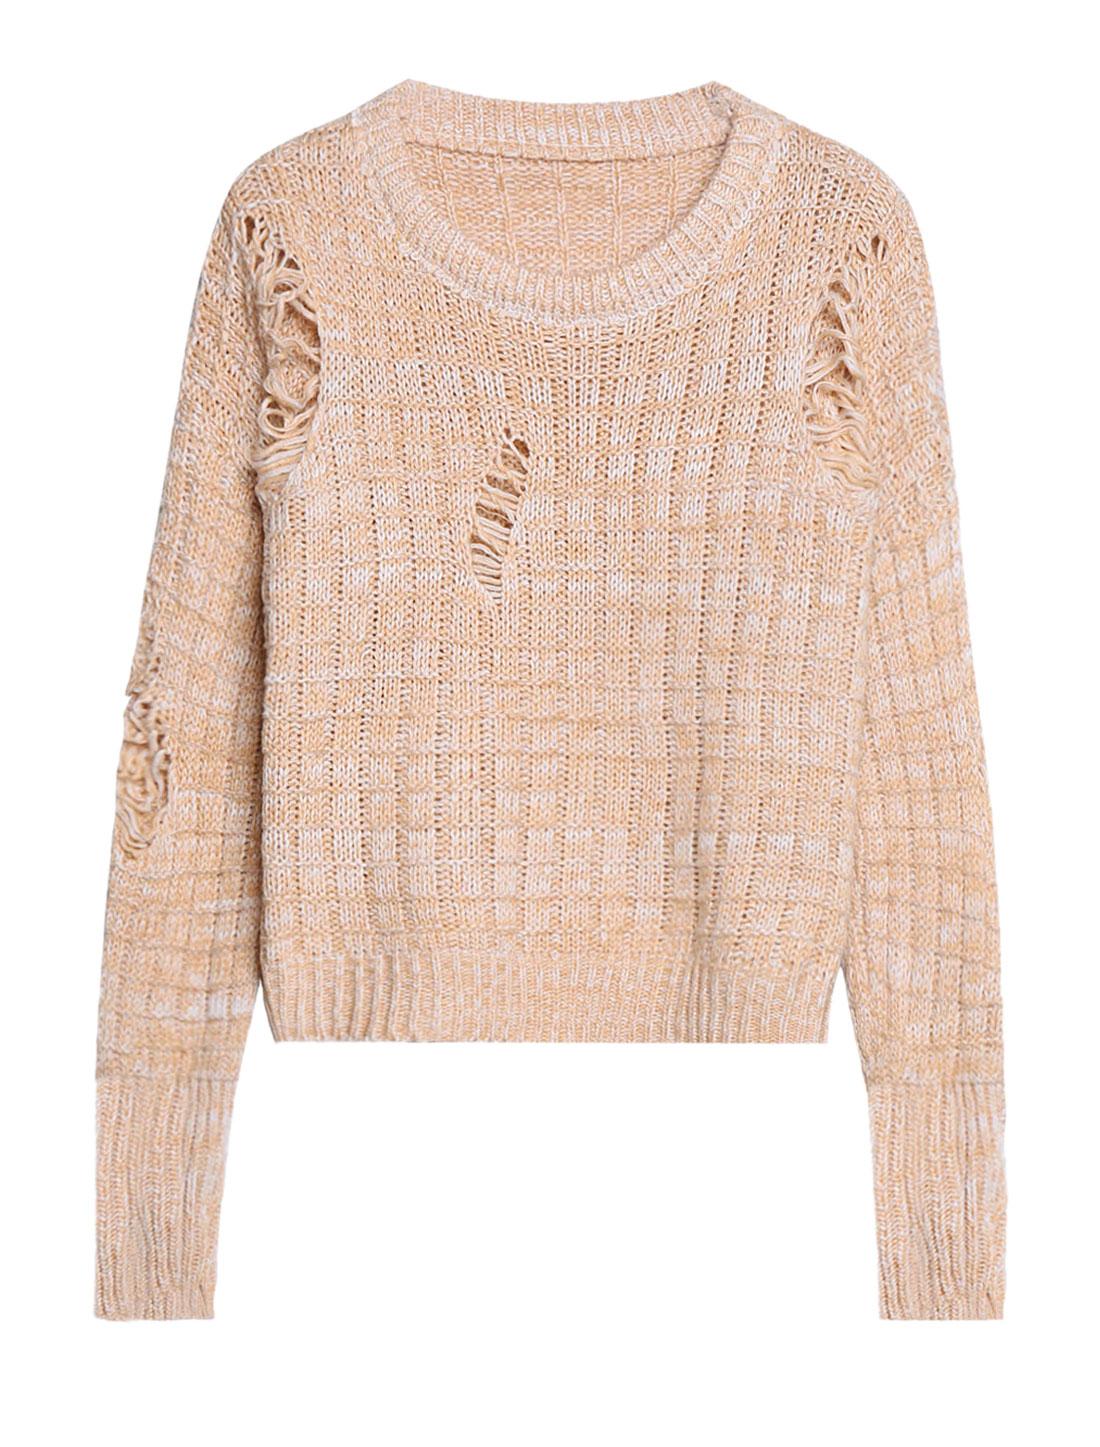 Woman Crew Neck Dolman Sleeves Distressed Sweater Beige XS